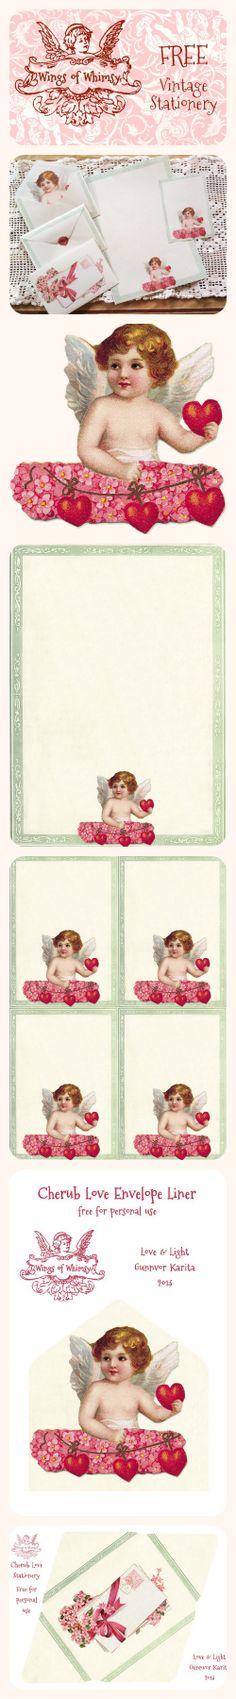 Wings of Whimsy: Vintage Stationery - free for personal use #vintage #ephemera #valentine #printable #freebie